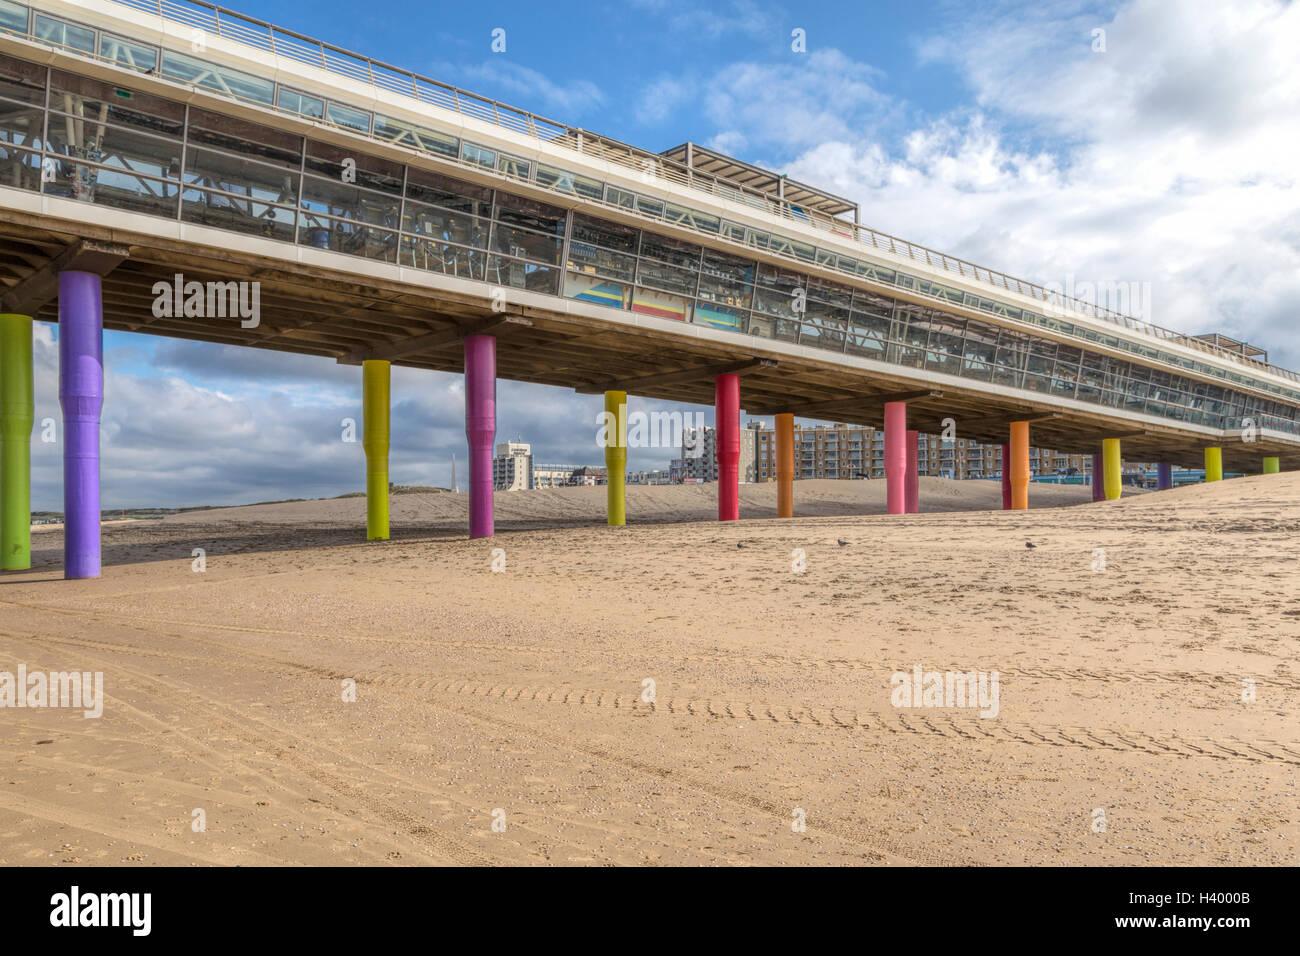 Beach and Pier of Scheveningen, Den Haag, The Hague, on the Dutch North Sea coast, South Holland, The Netherlands, Stock Photo